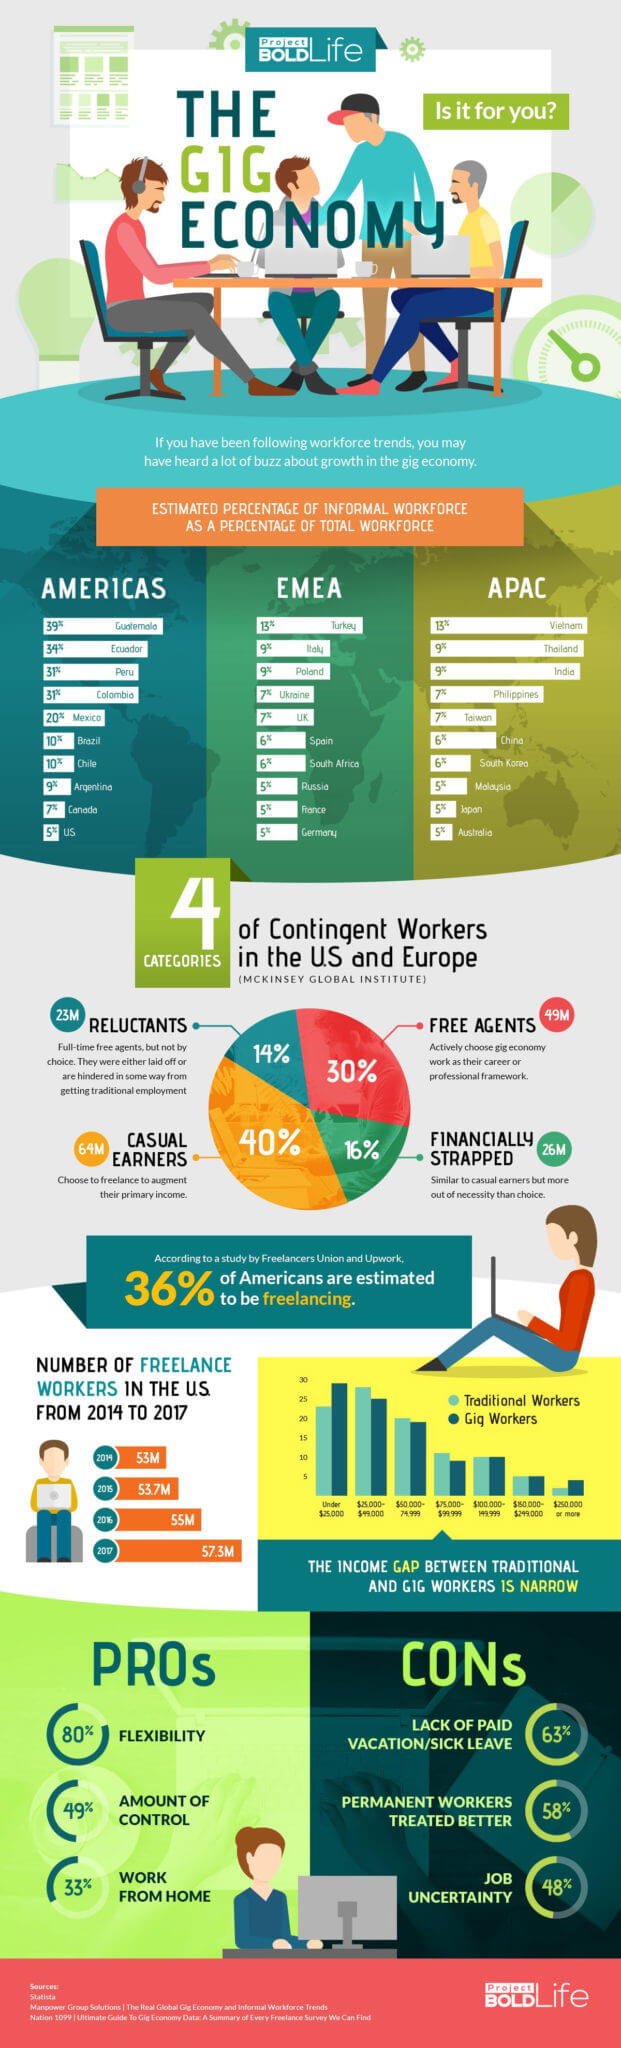 the gig economy infographic